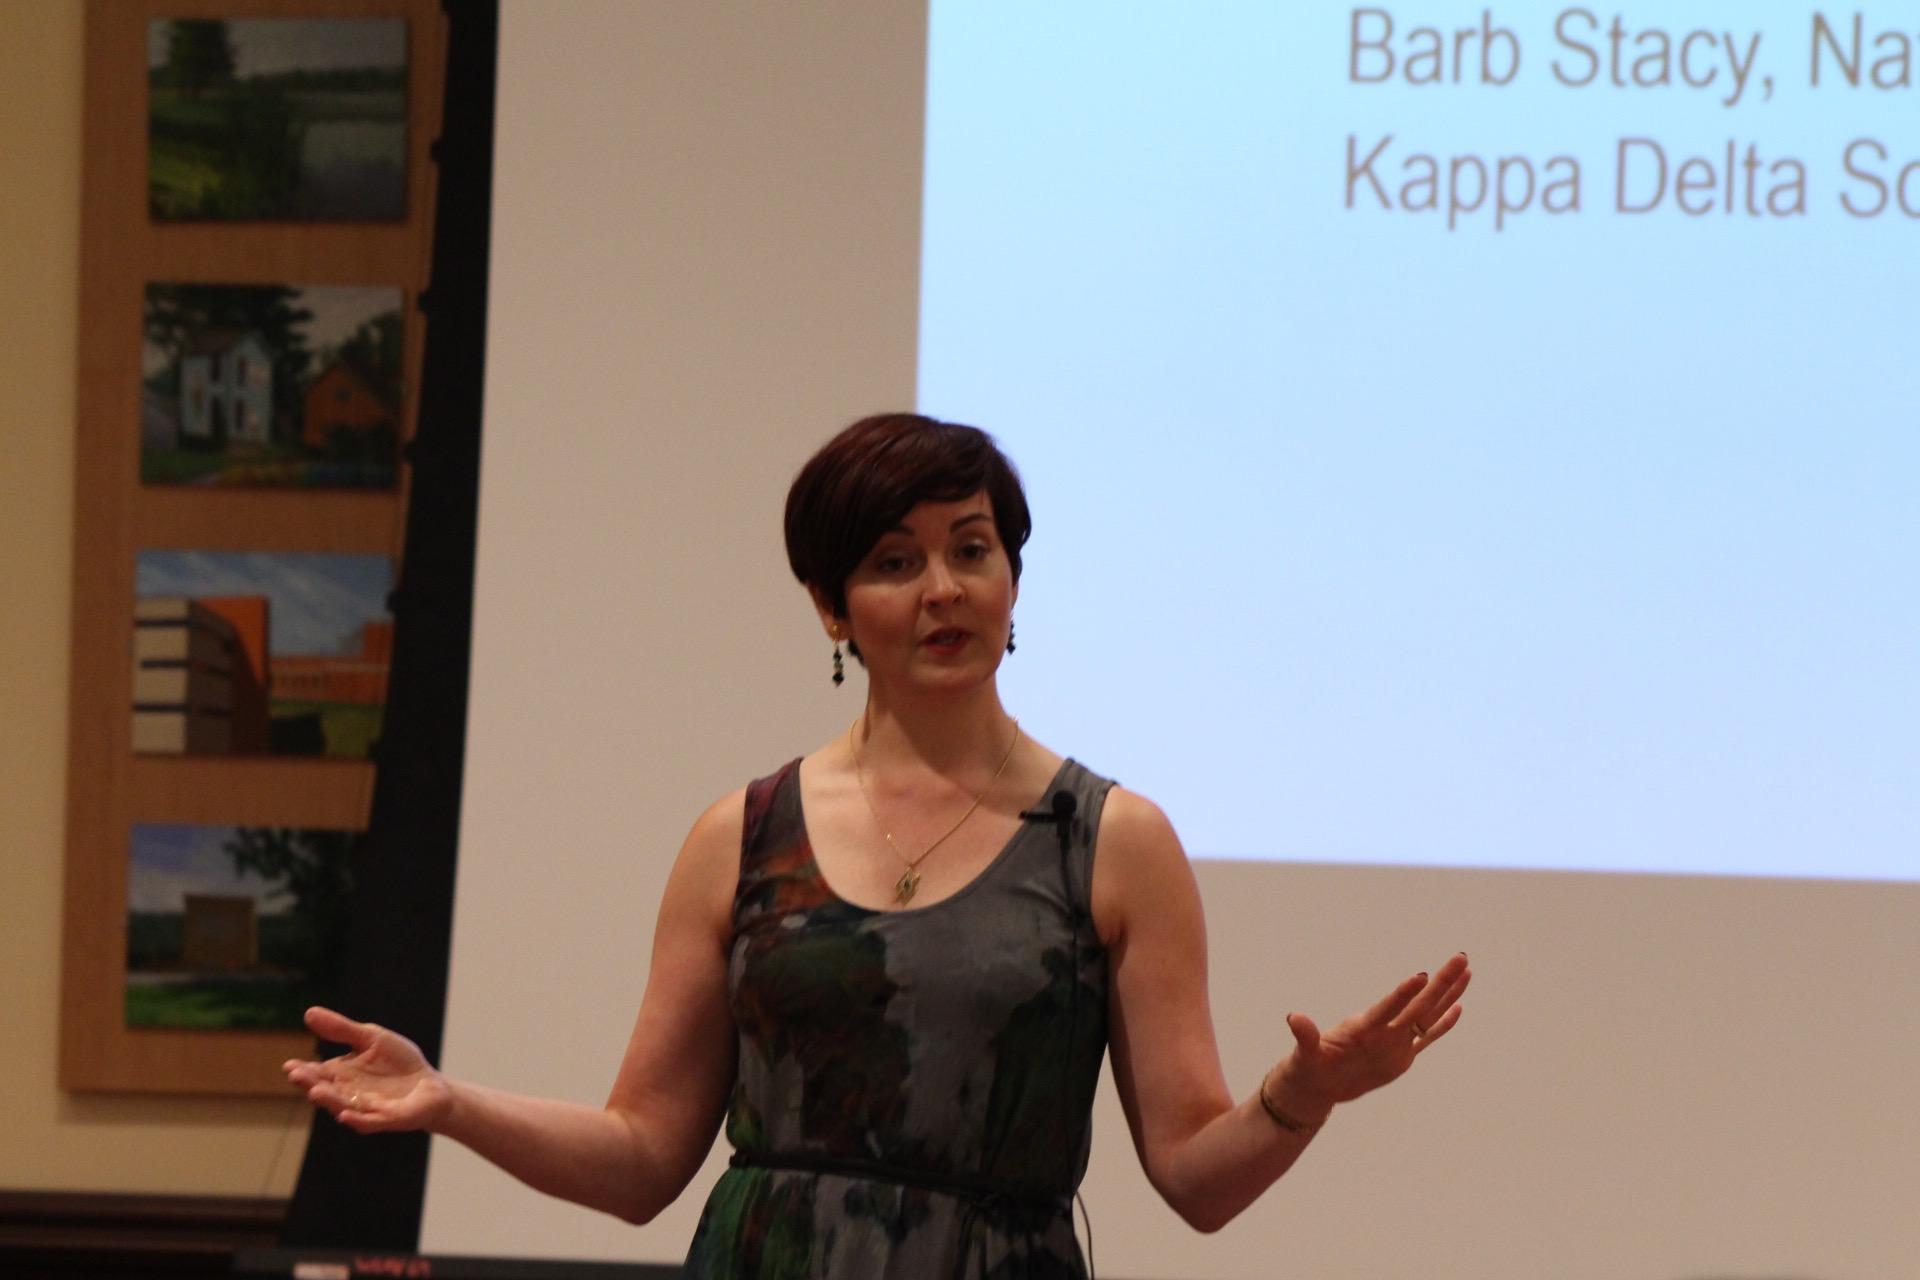 2017 Barb Stacy Visit/ Talk